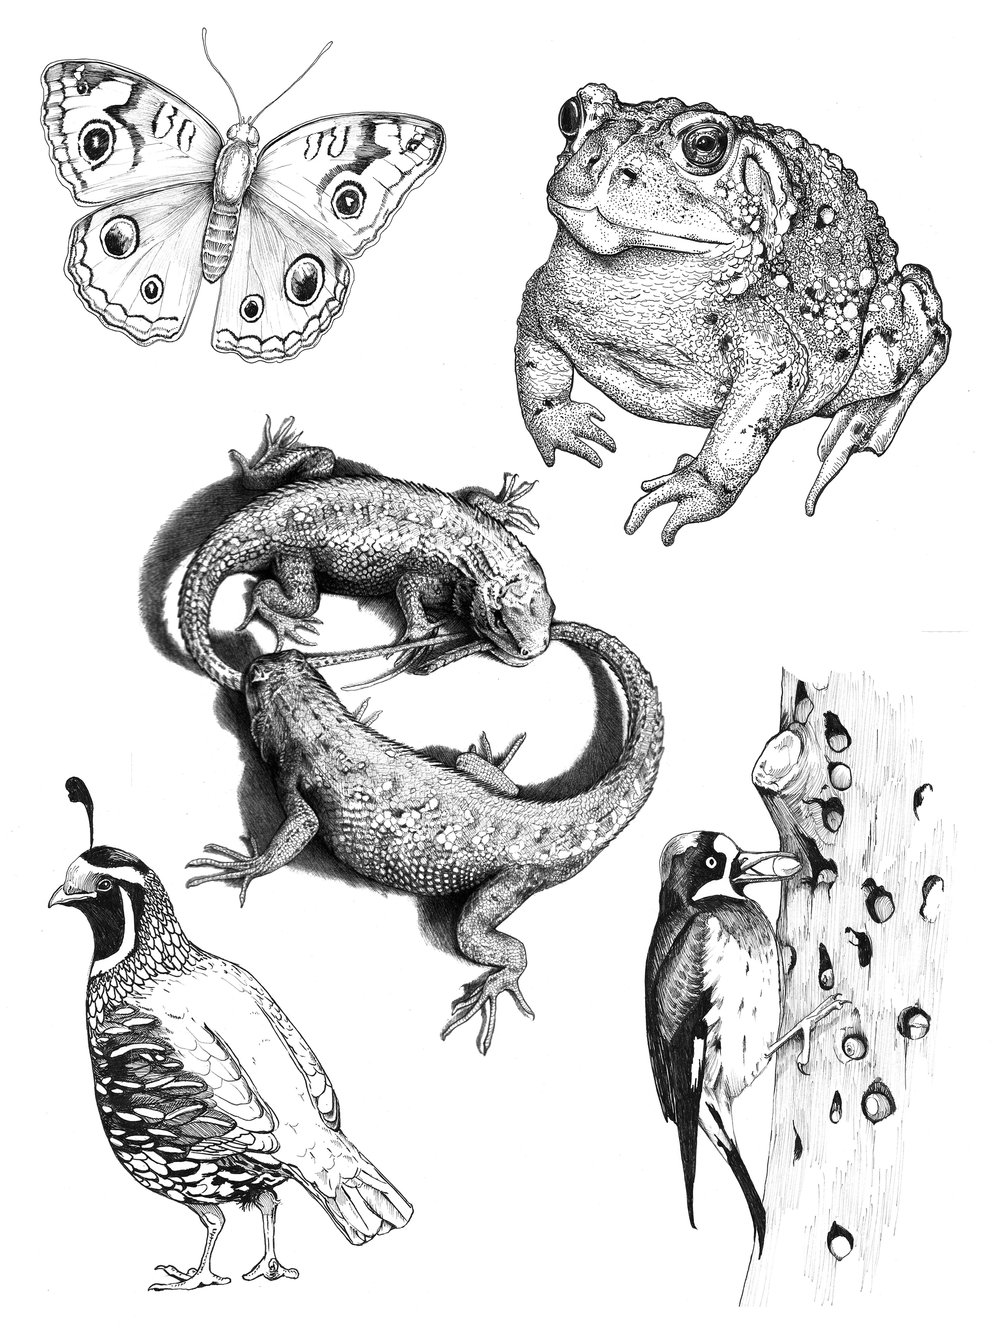 Excerpts From California Junior Illustrator Coloring Book